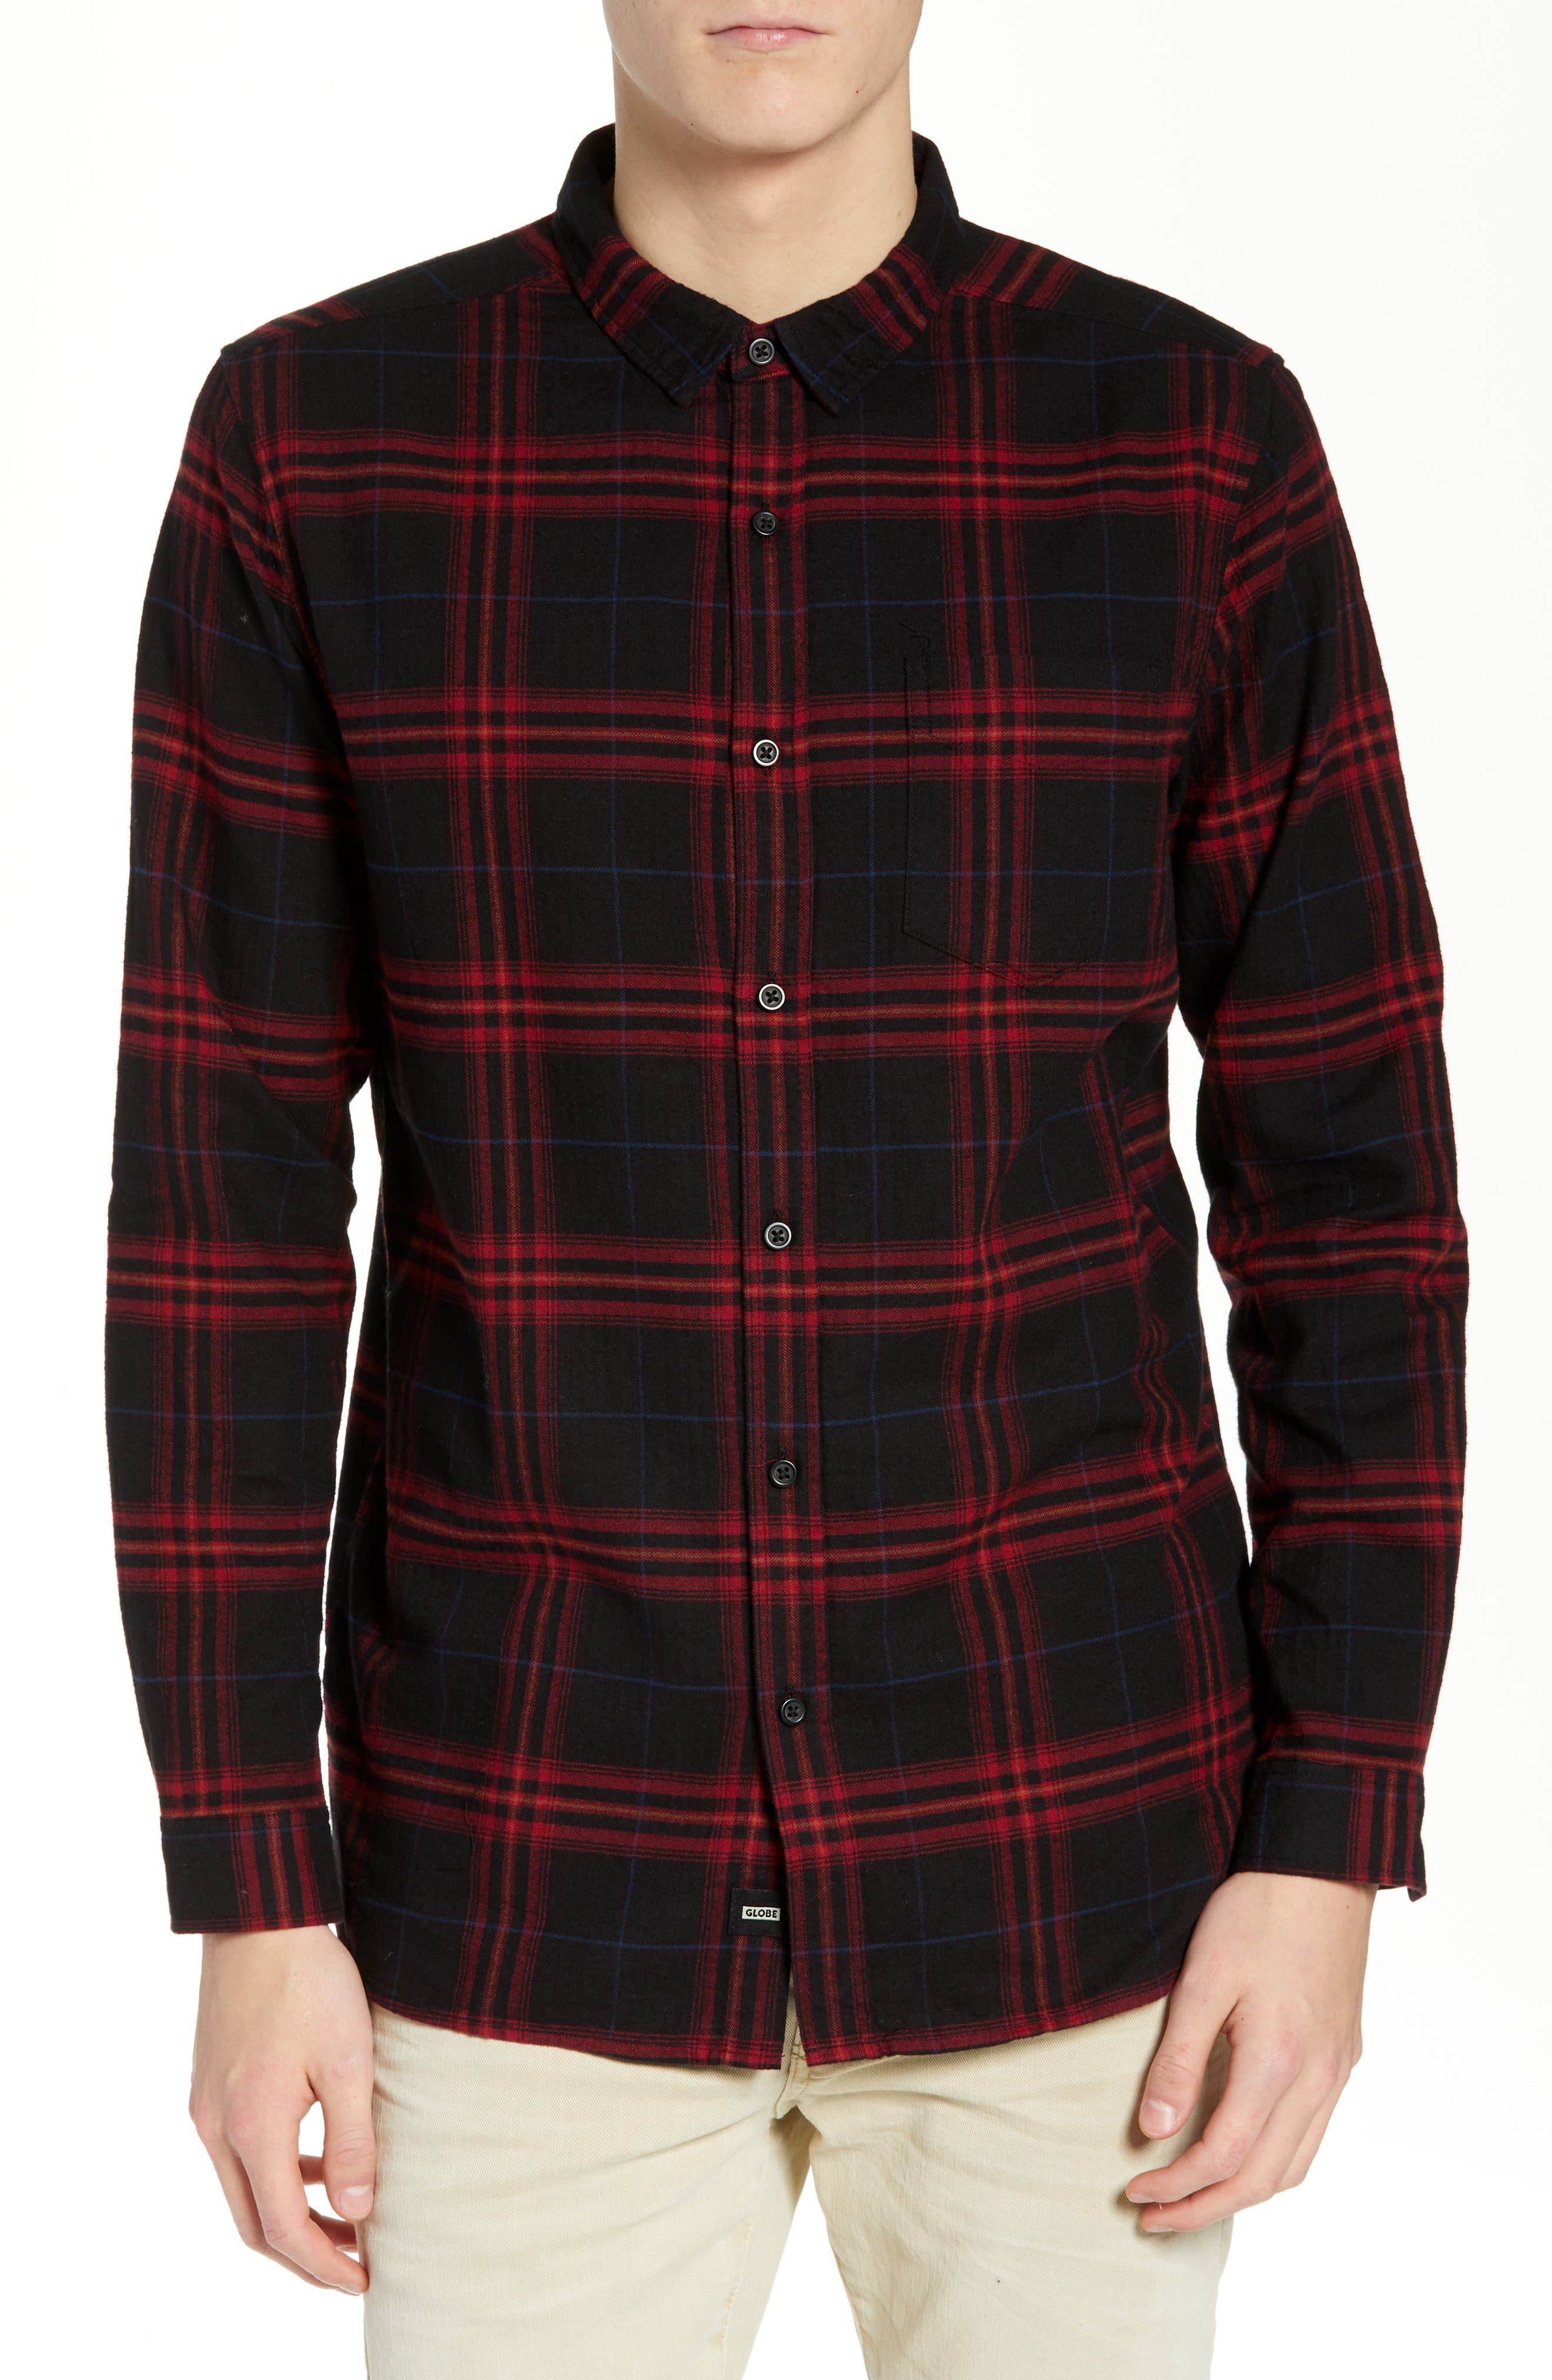 GLOBE Dock Plaid Shirt in Red